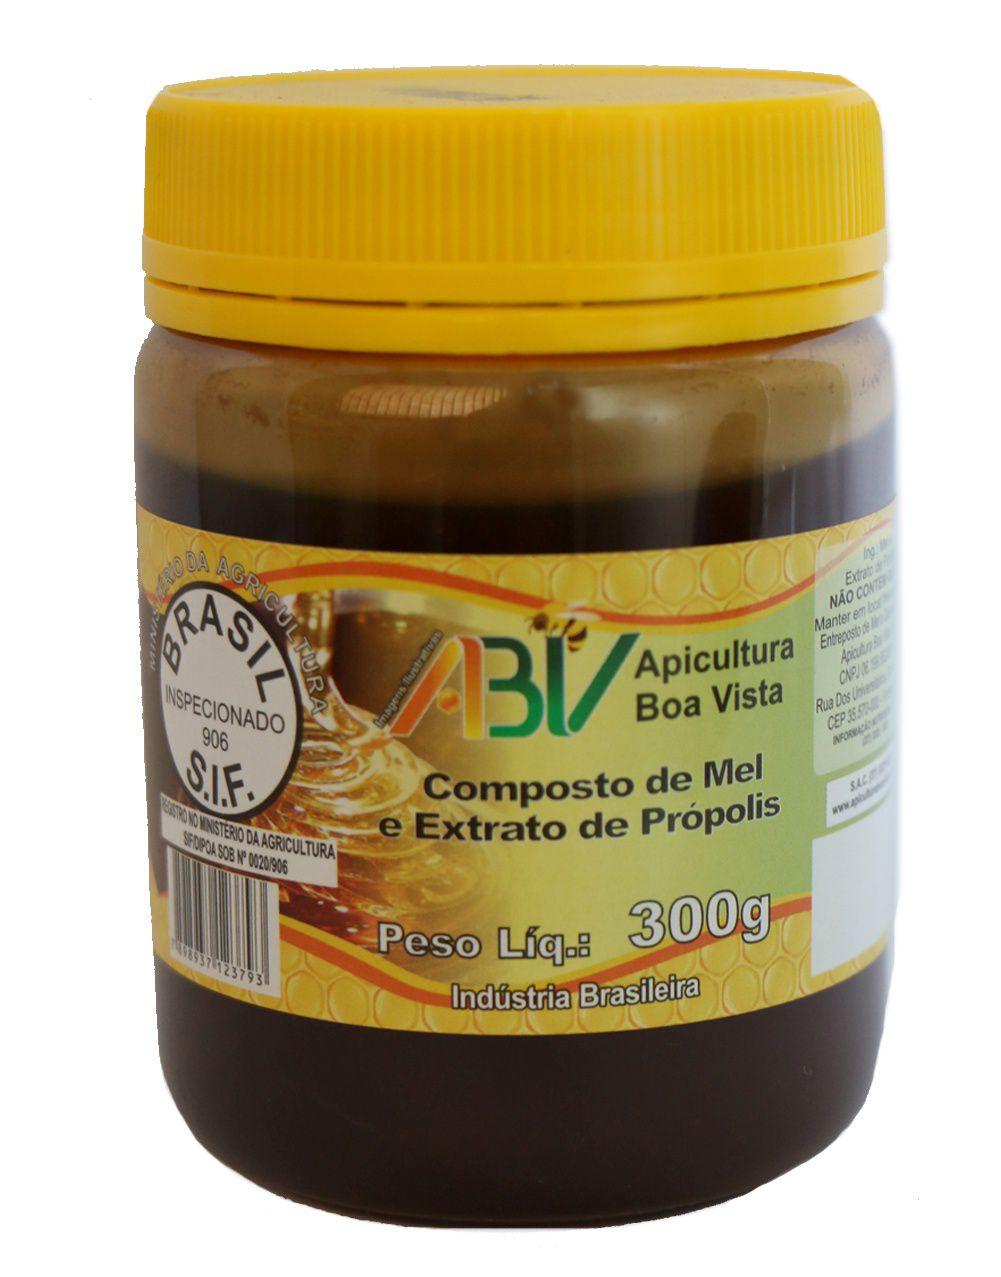 Composto de mel e extrato de própolis pote plástico 300g